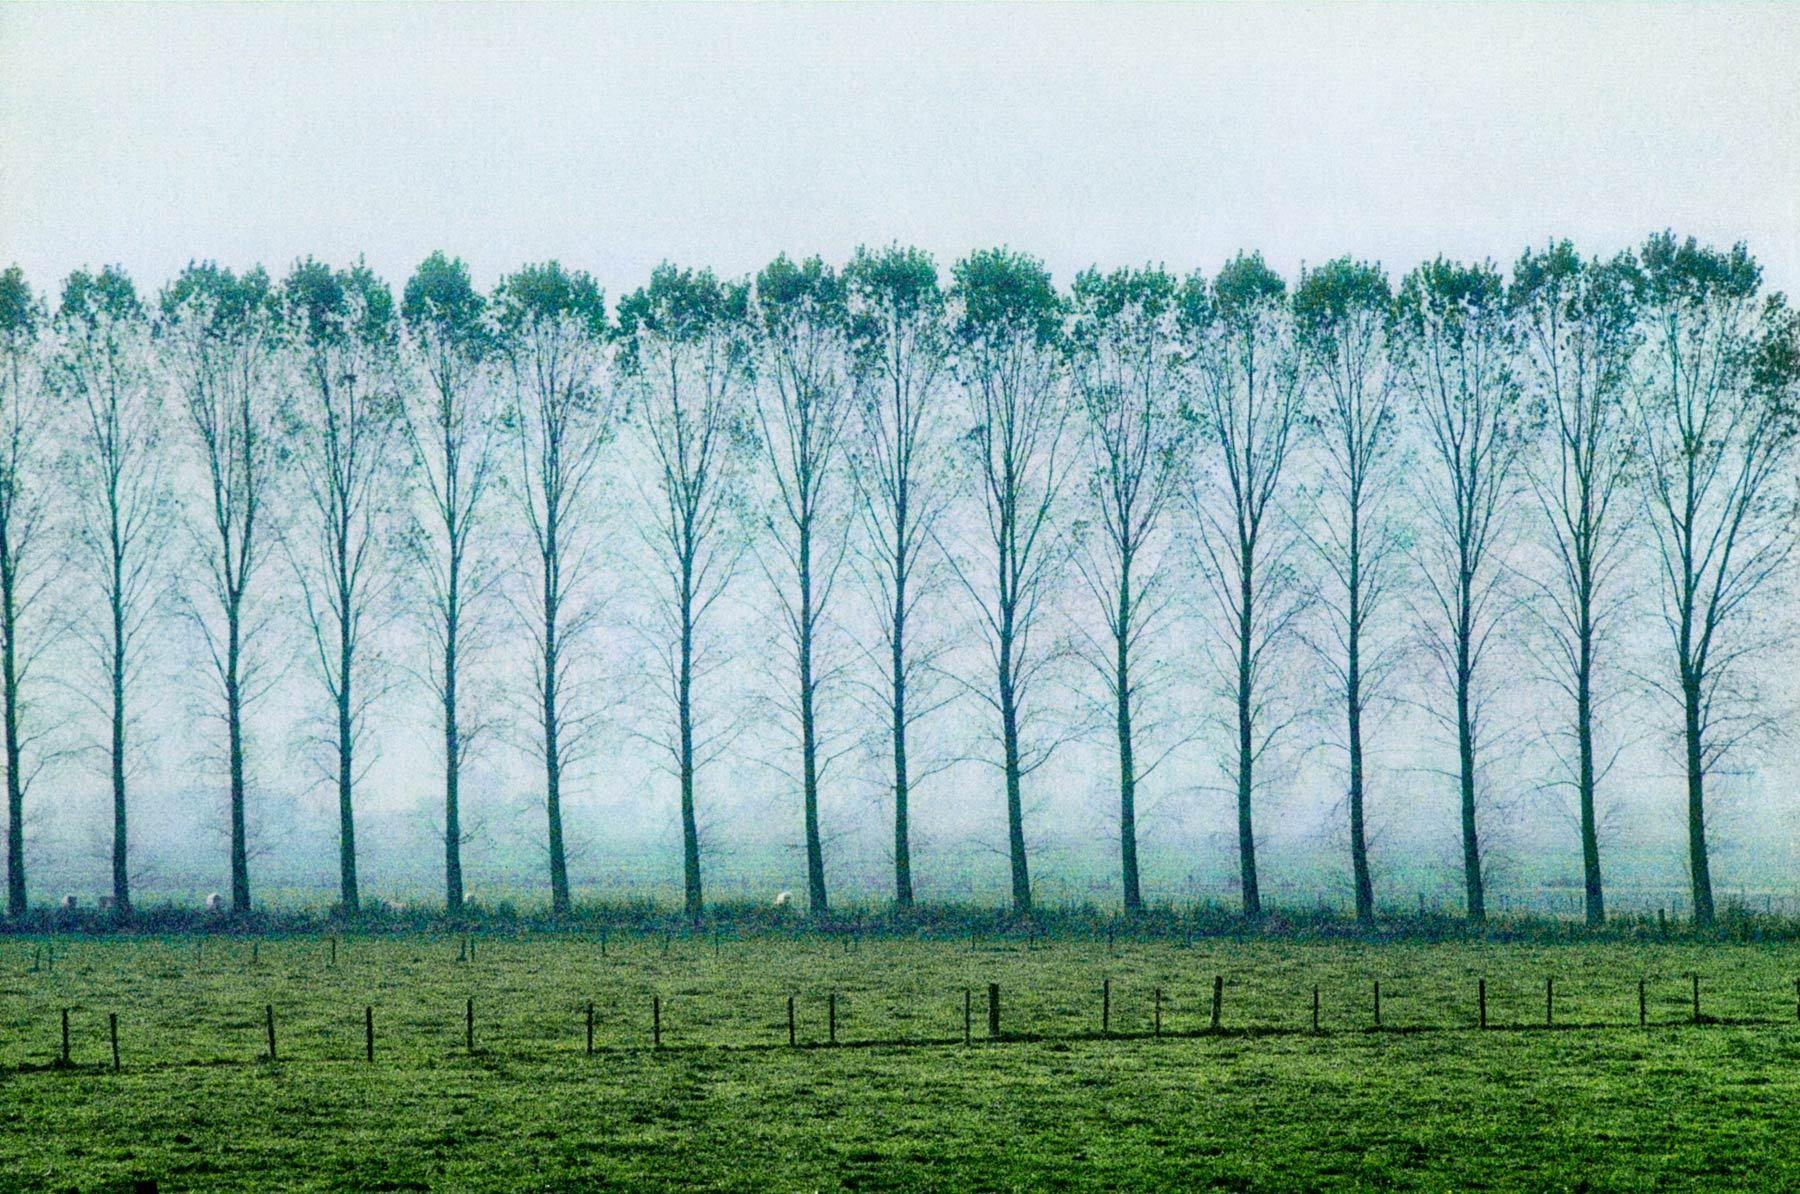 Windbreak, The Netherlands